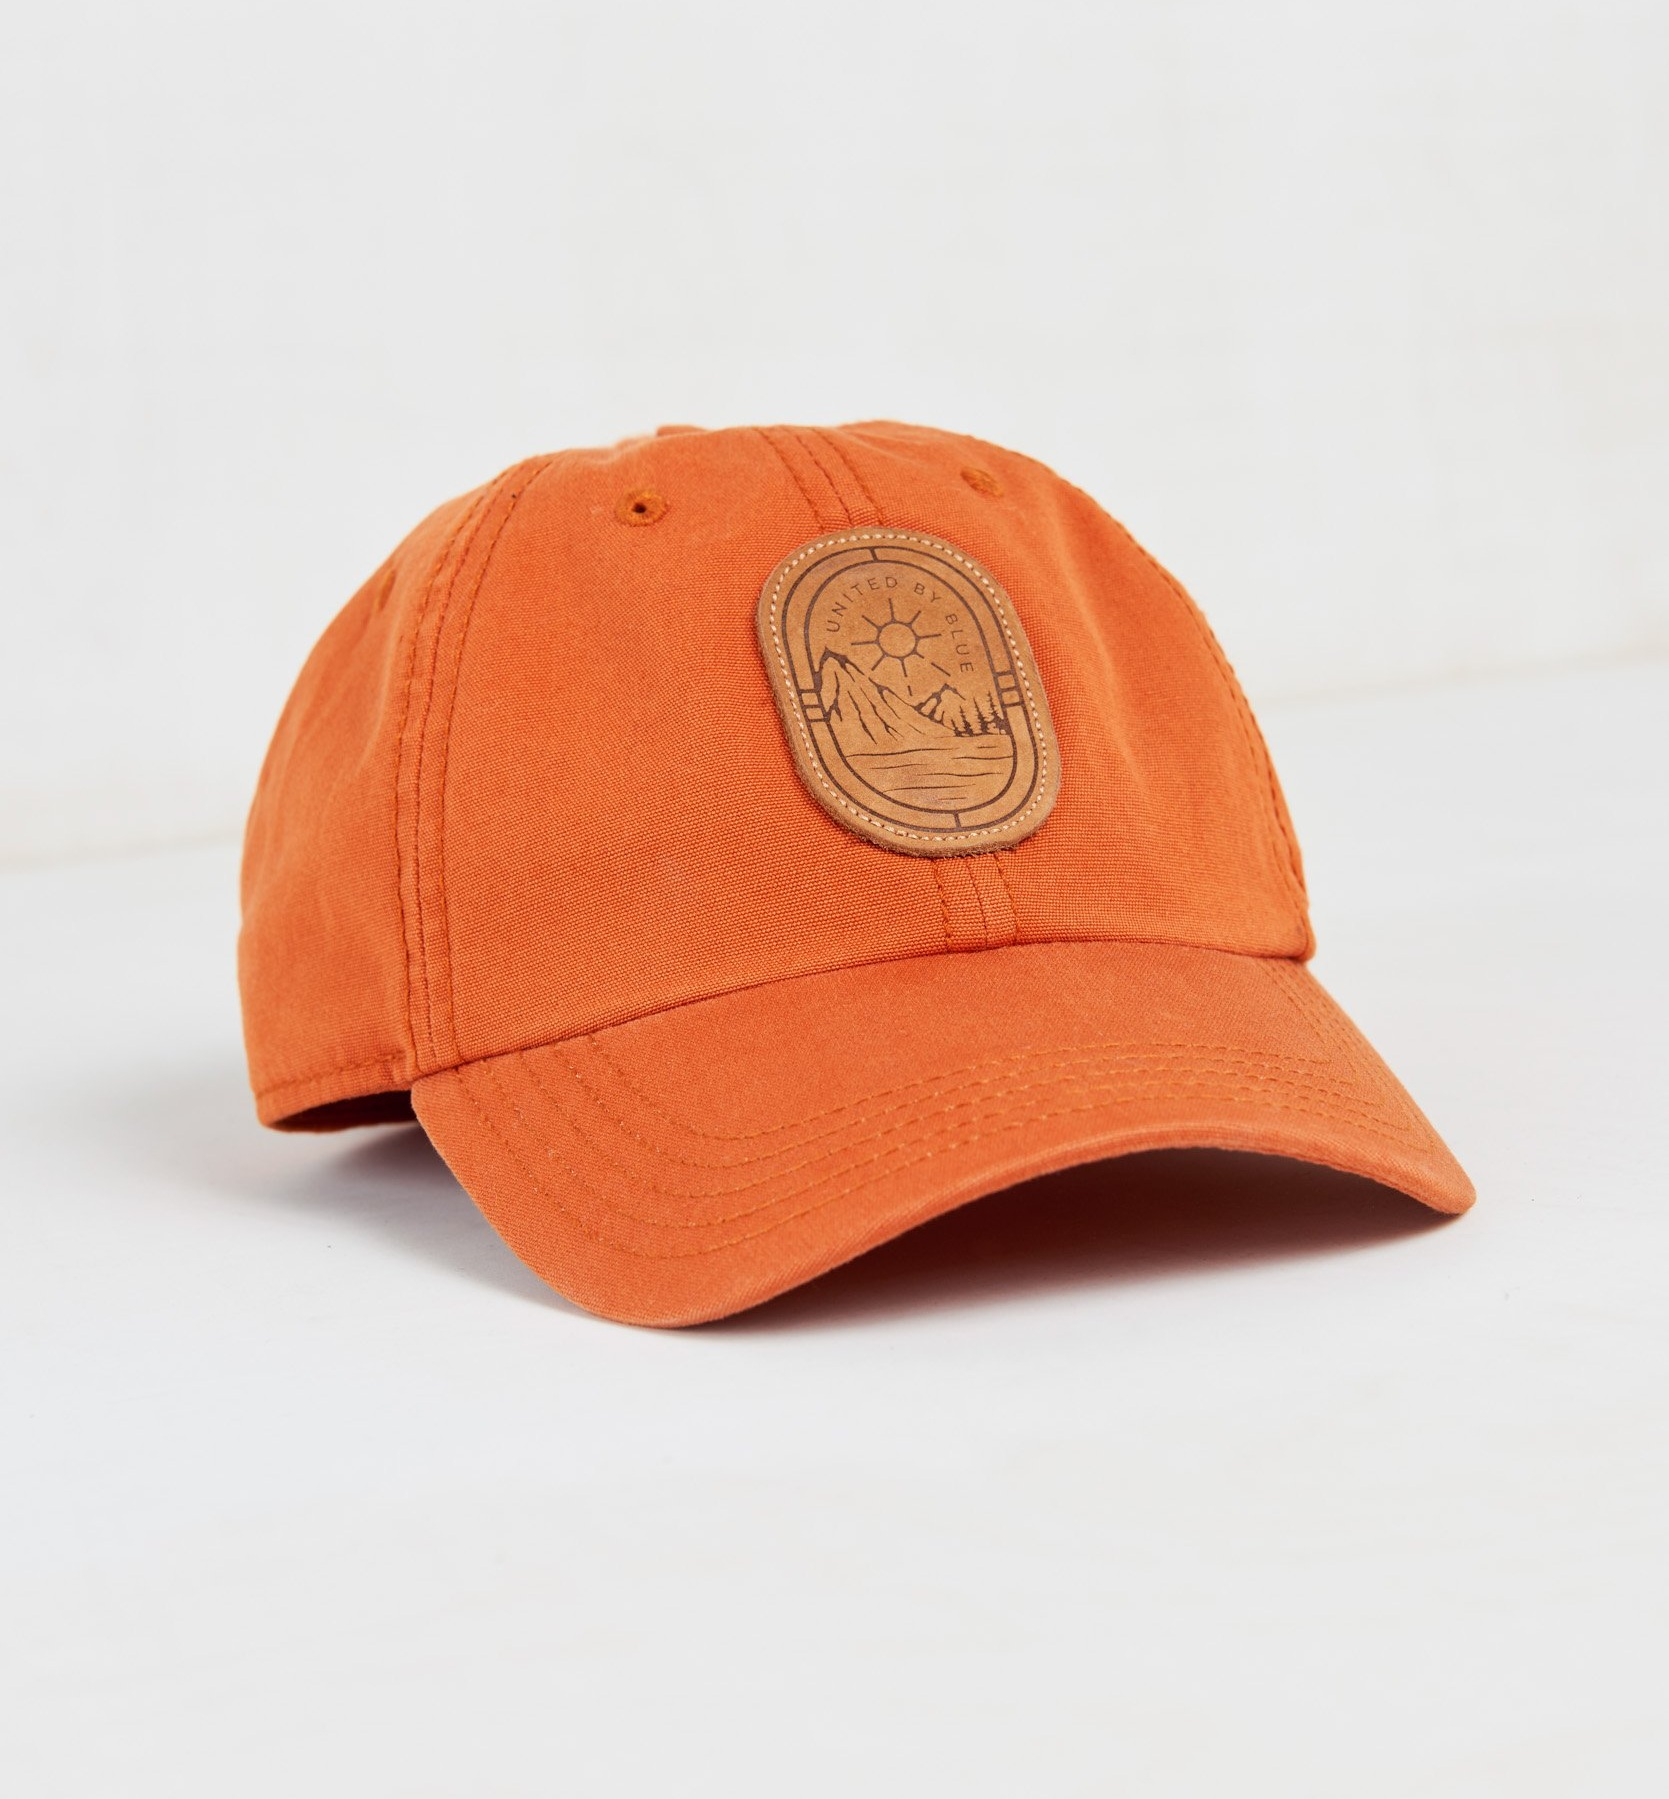 Coastal Pines Baseball Hat - $28.00